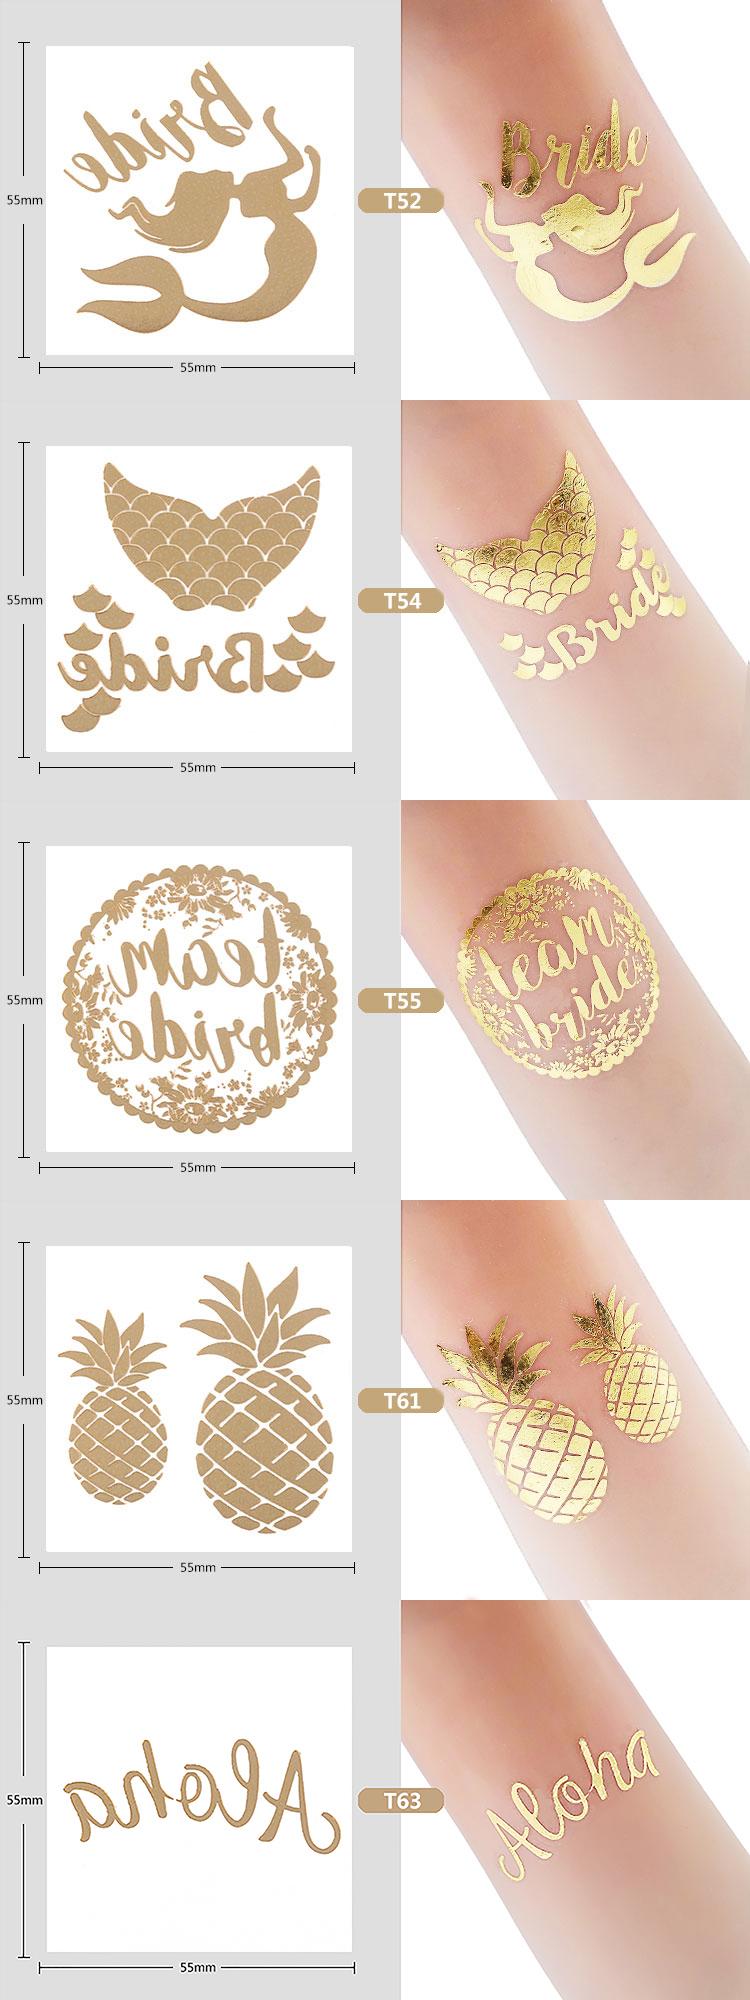 Designs Bride Tribe Bachelorette Wedding Party Team Gold Temporary Body Tattoos